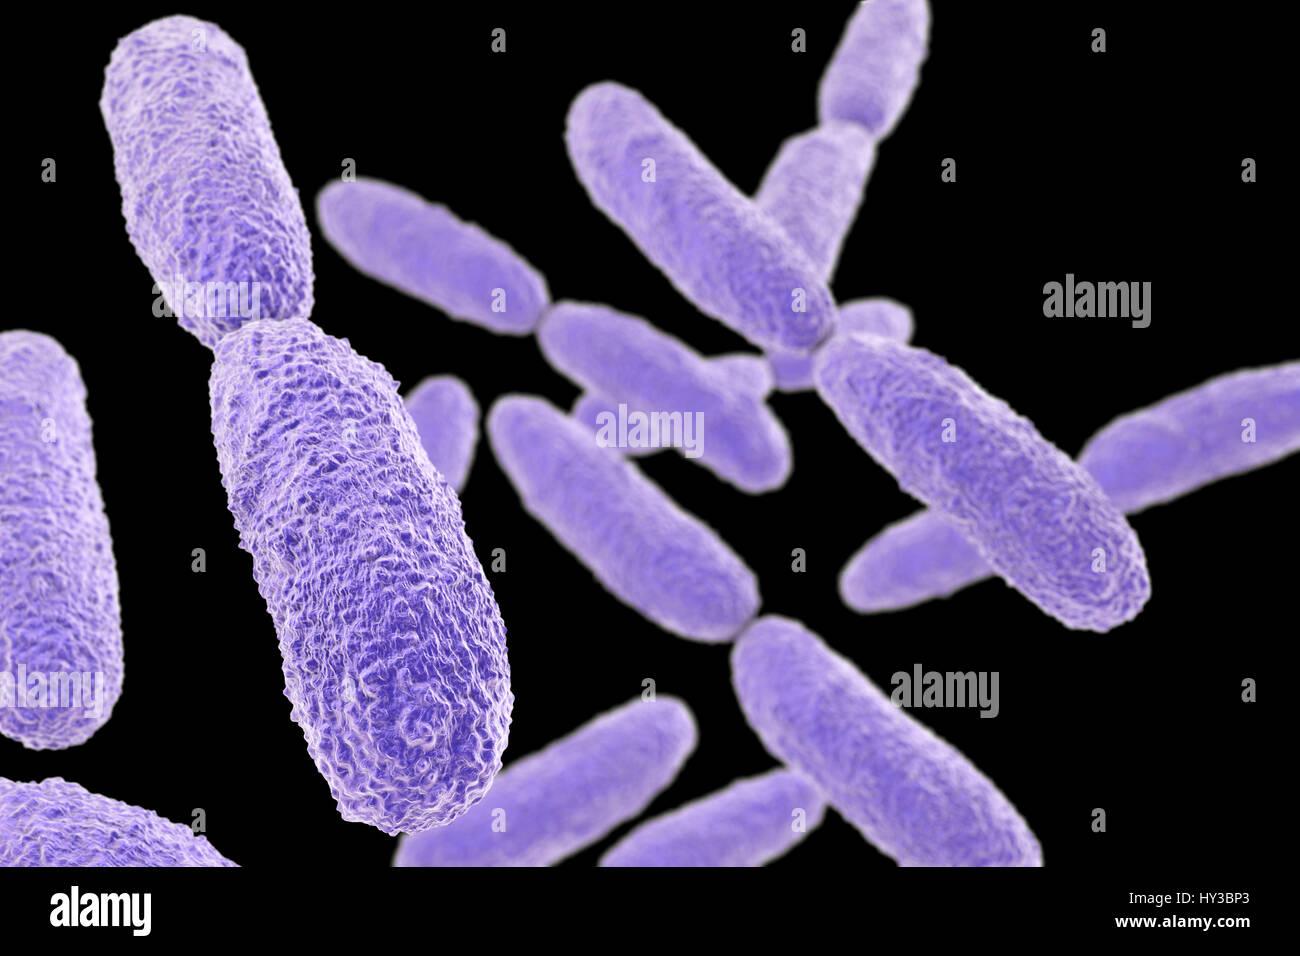 What is pneumonia 19